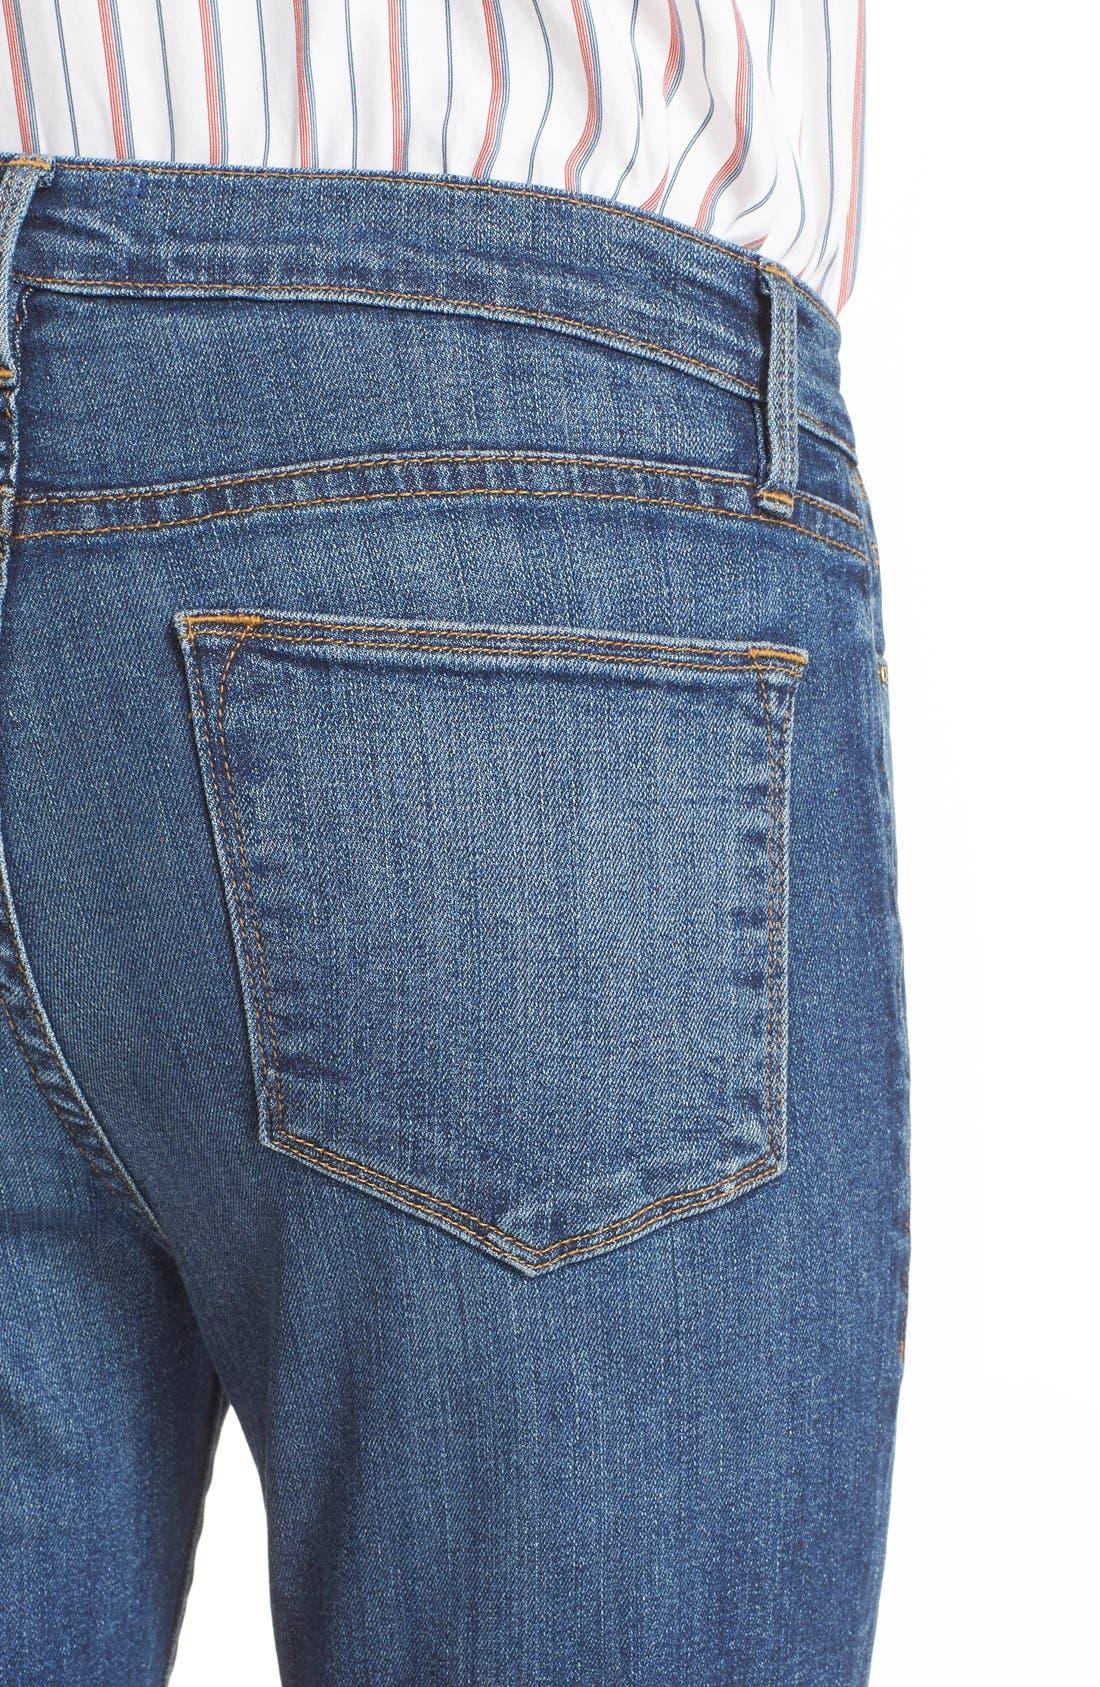 'Le High Flare' Jeans,                             Alternate thumbnail 18, color,